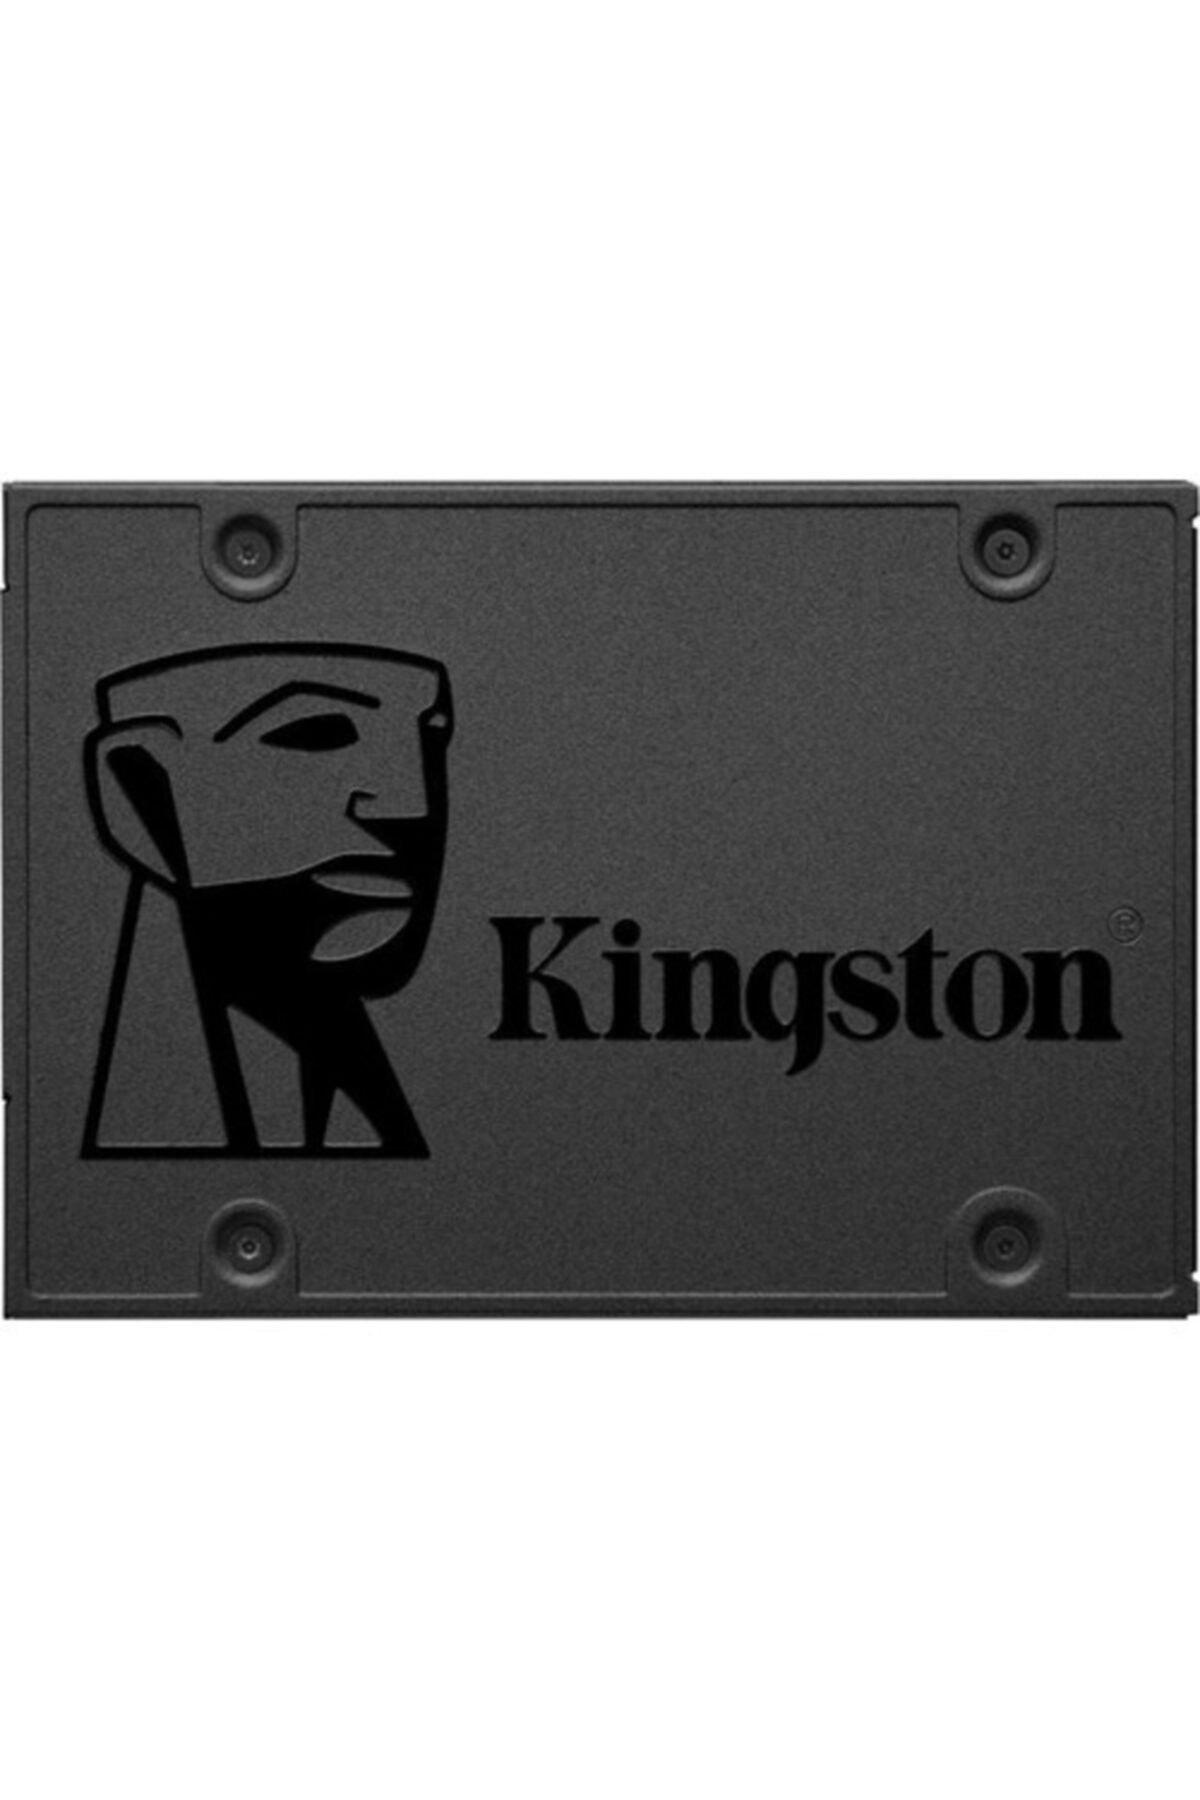 Kingston A400 Ssd 240gb 500mb-350mb/s Sata3 Ssd (Sa400s37/240g) 1